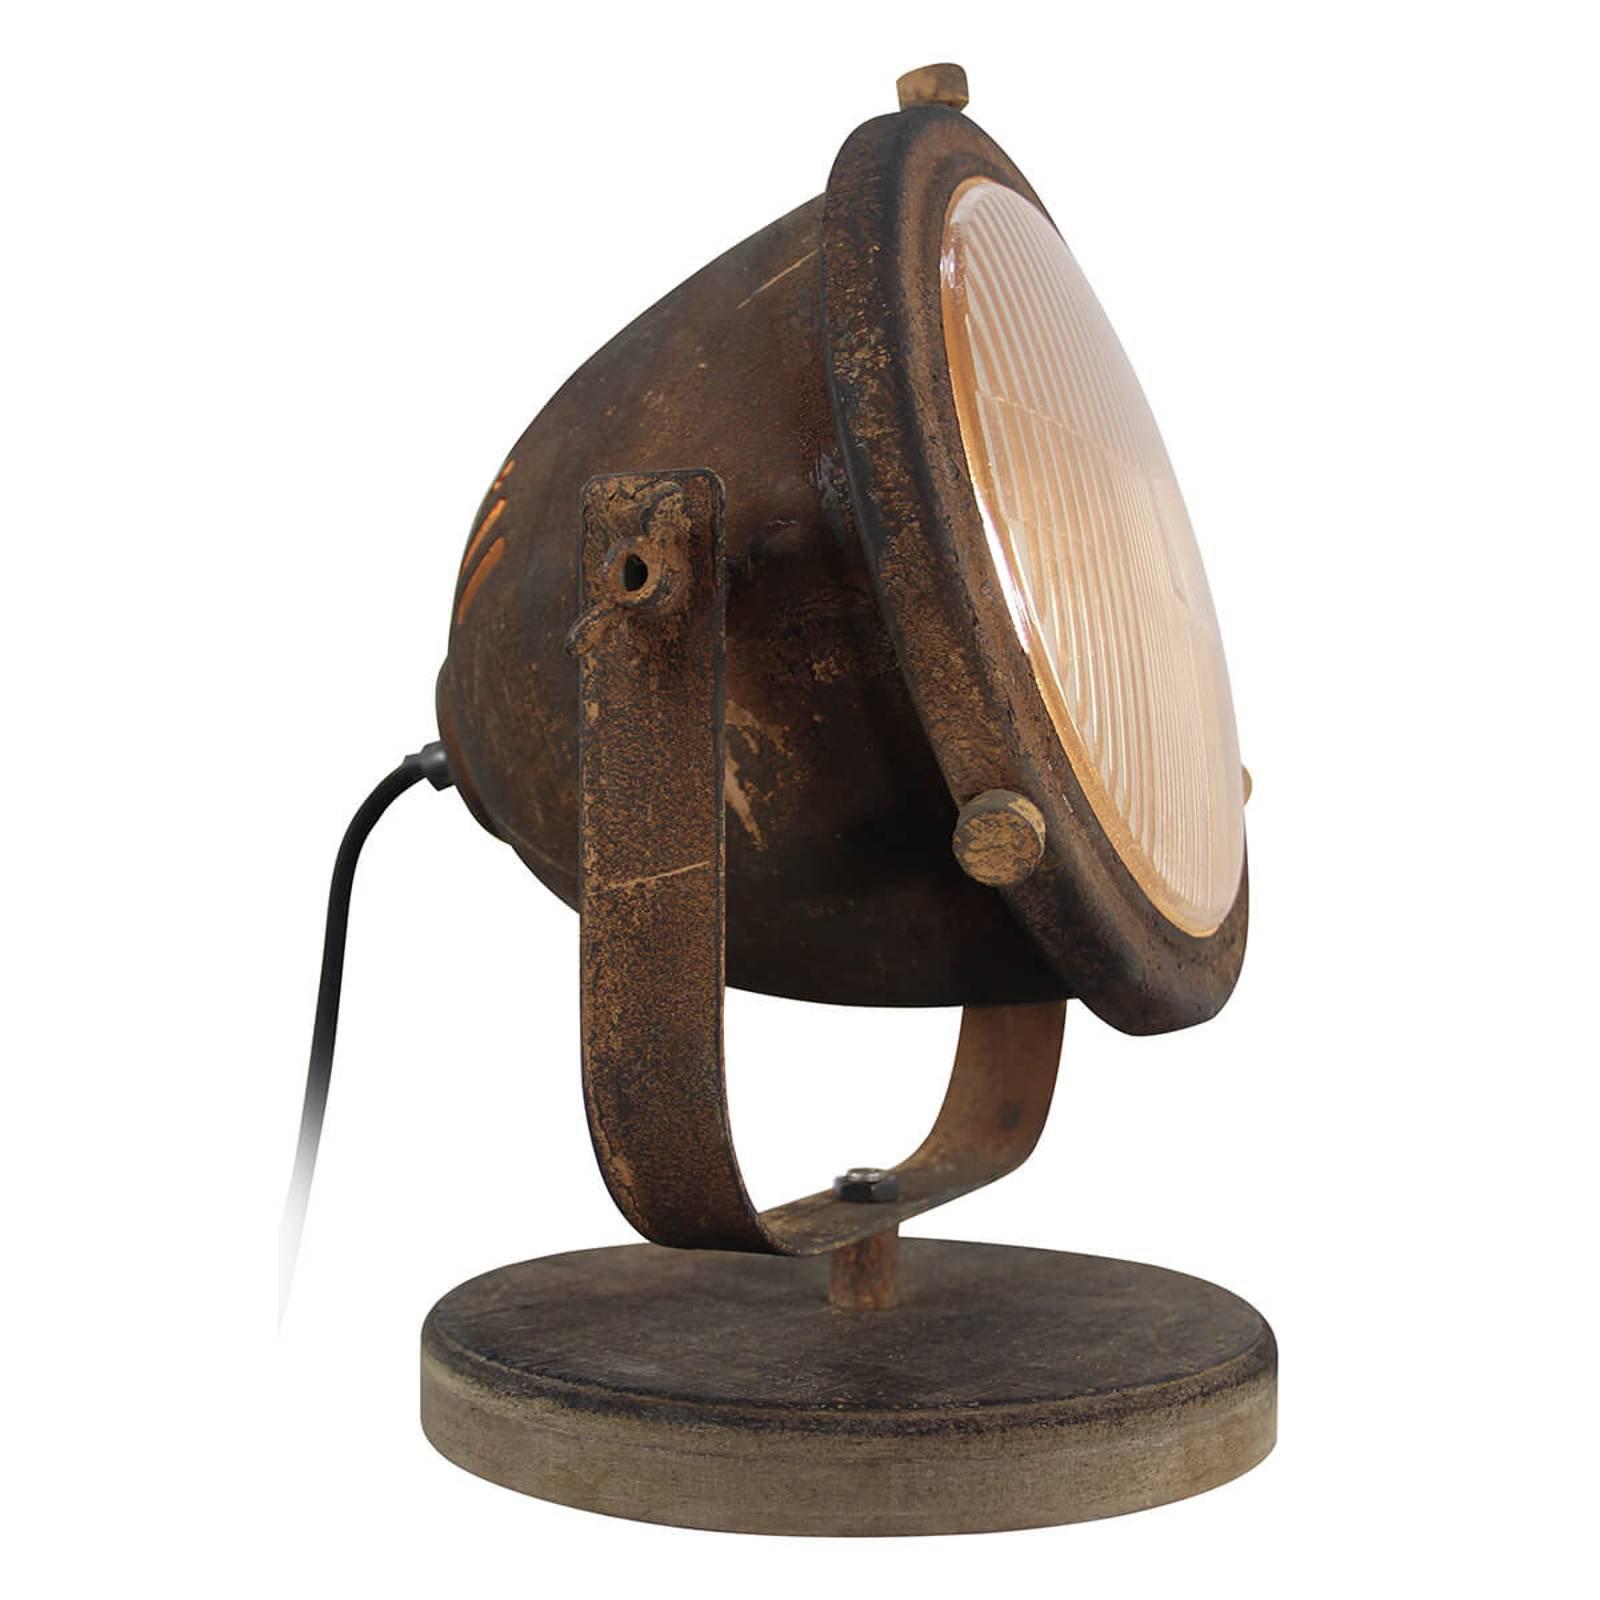 Bordlampe Carmen i industriell stil, rustfarget